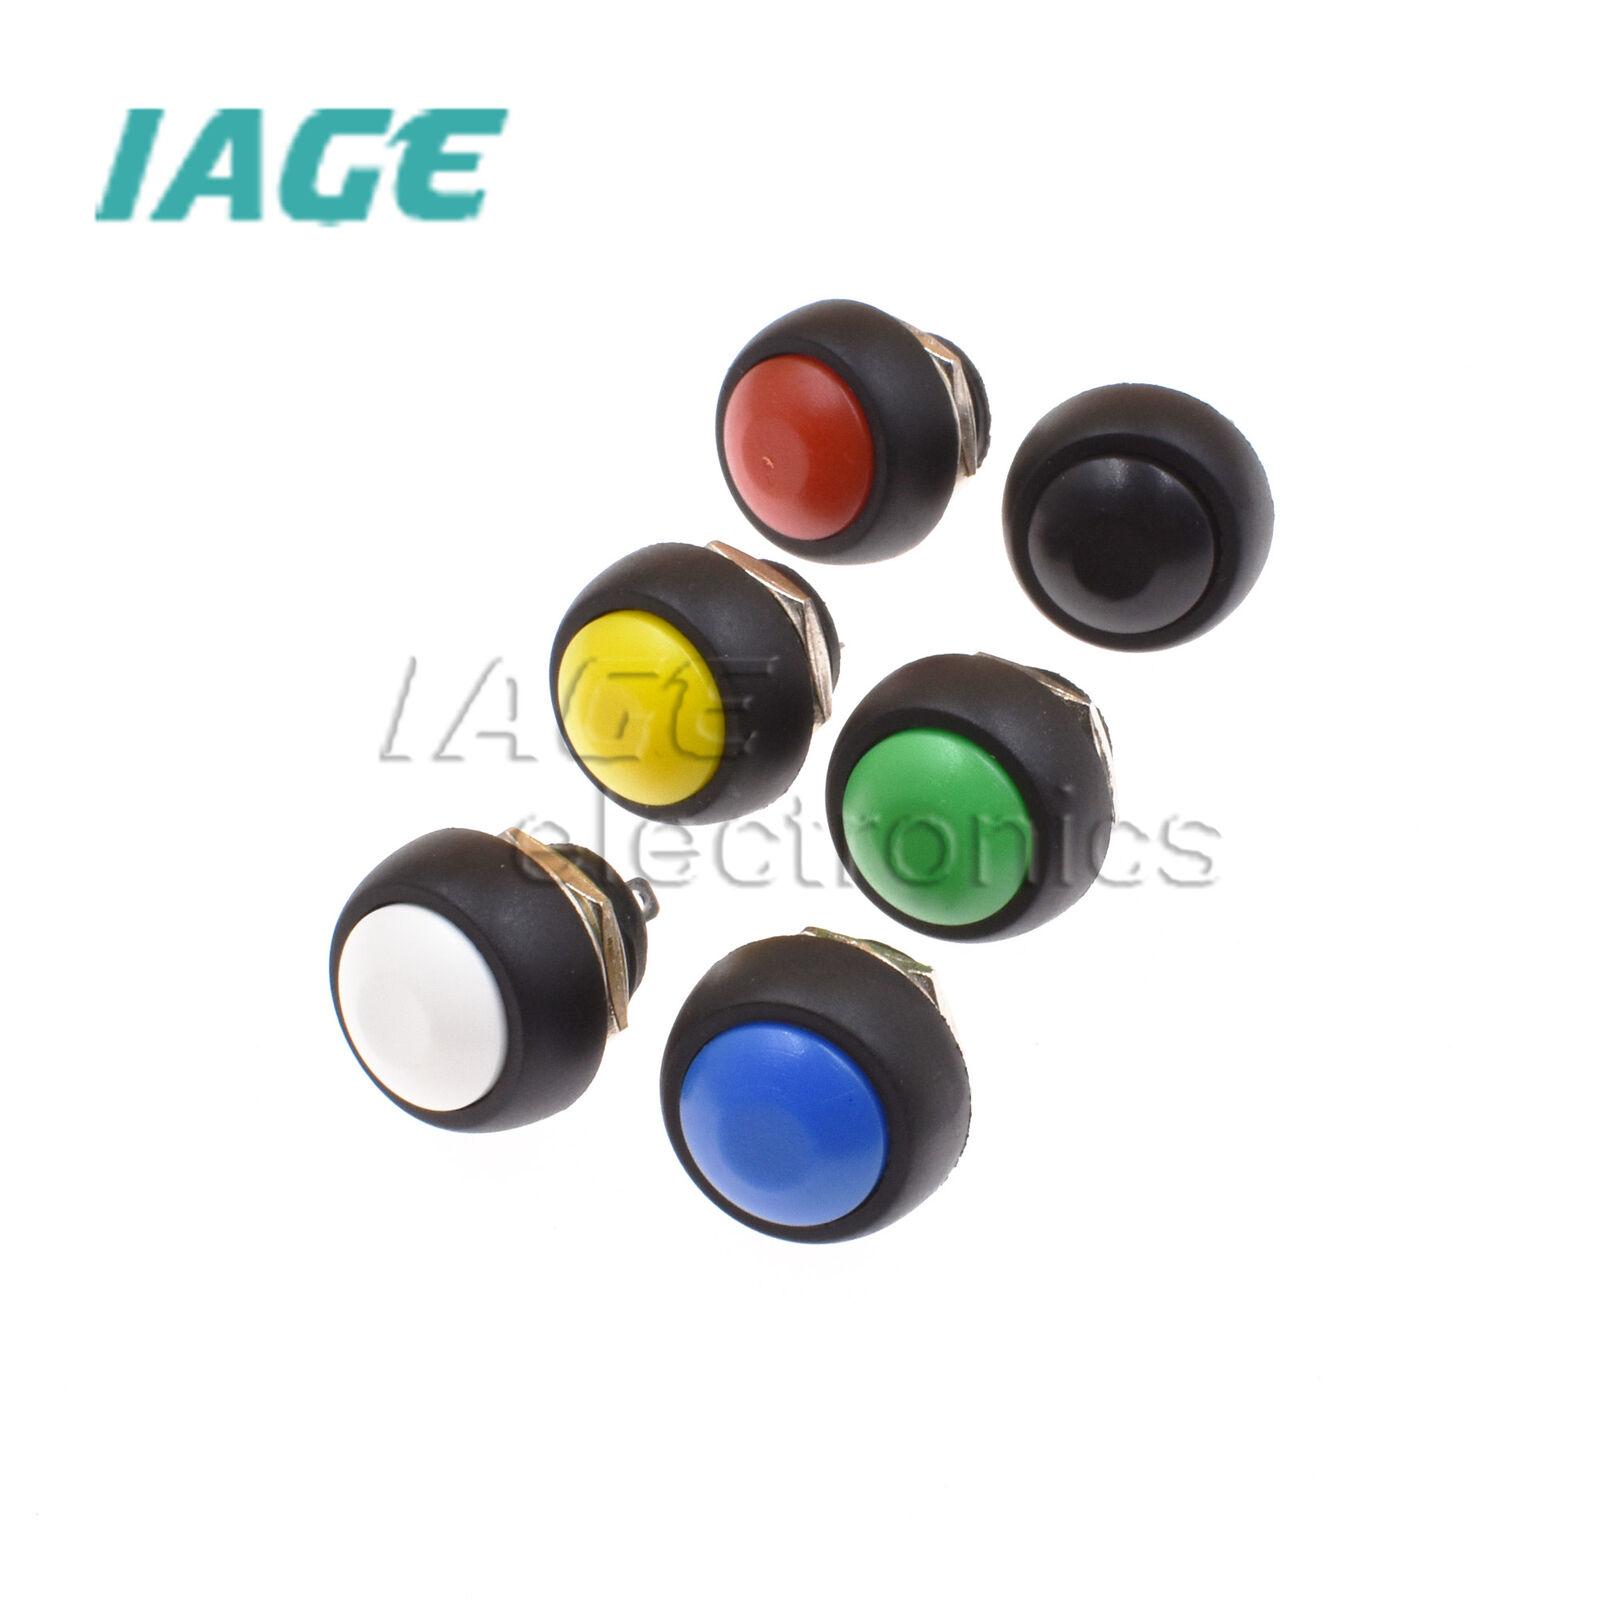 2//5Pcs Mini 12mm Waterproof Momentary ON//OFF Push Button Round Schalter L2KS